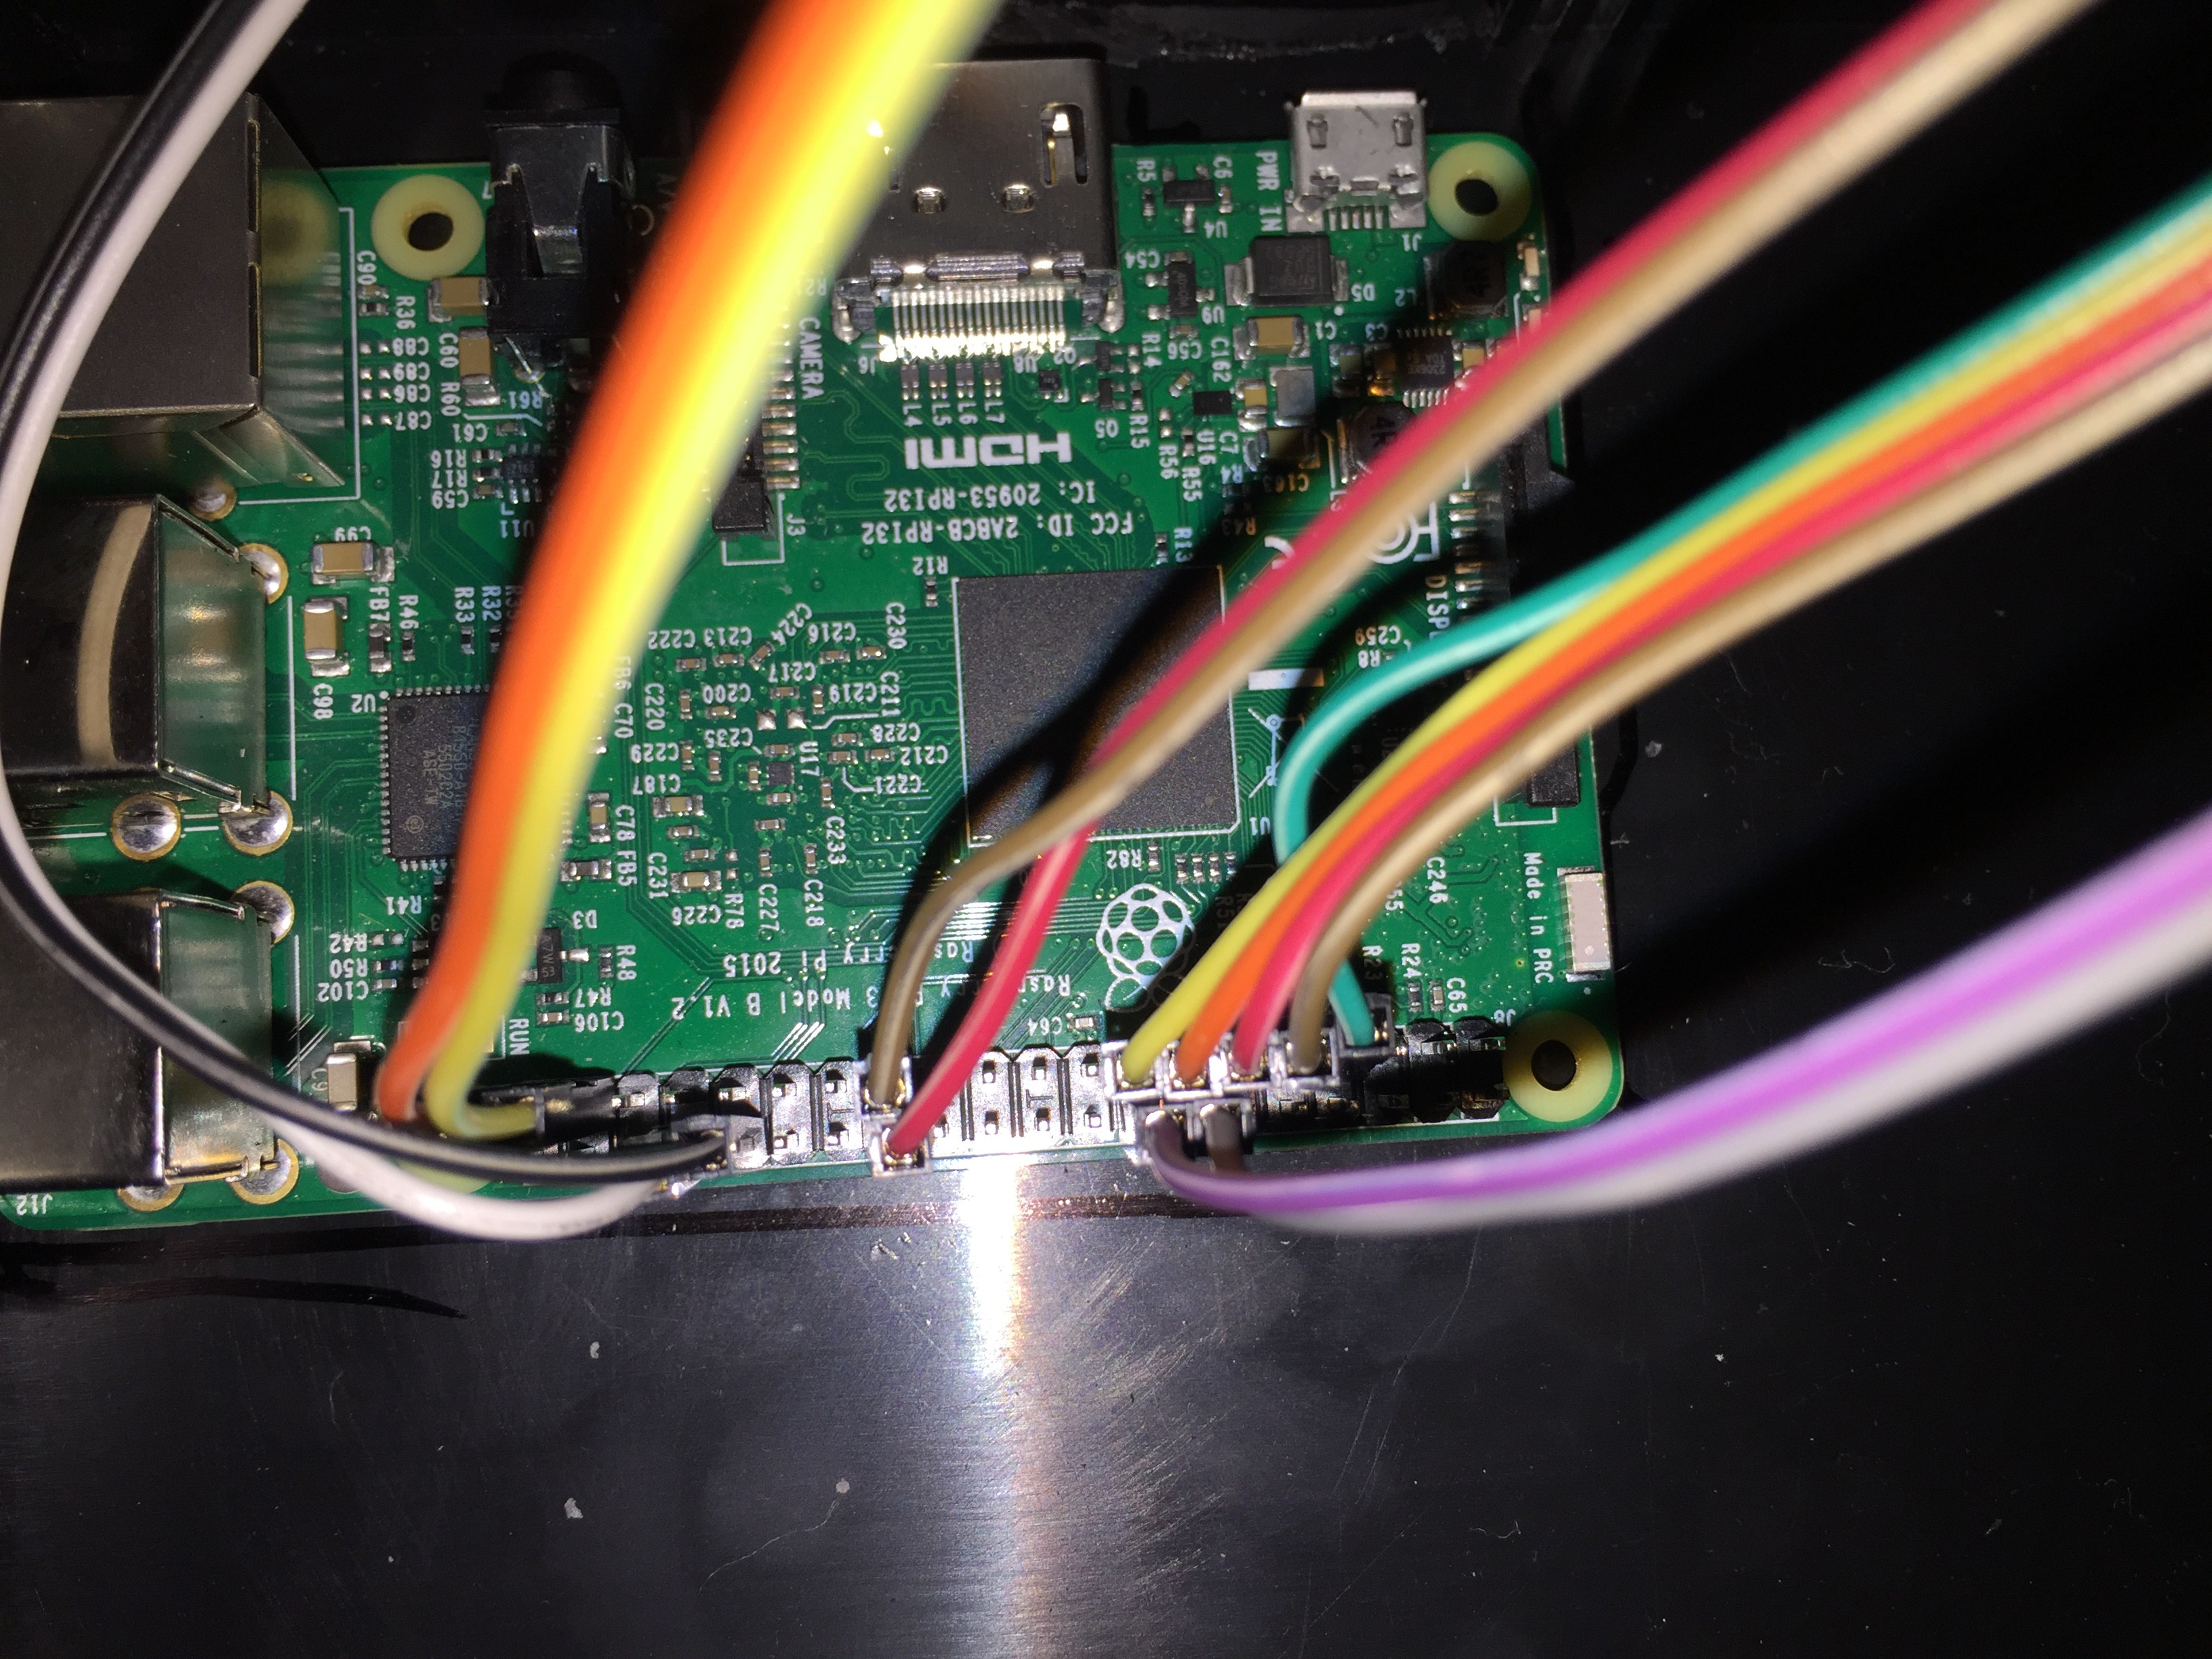 Xbox 360 Slim Jtag Wiring Diagram Free Download Wiring Diagram